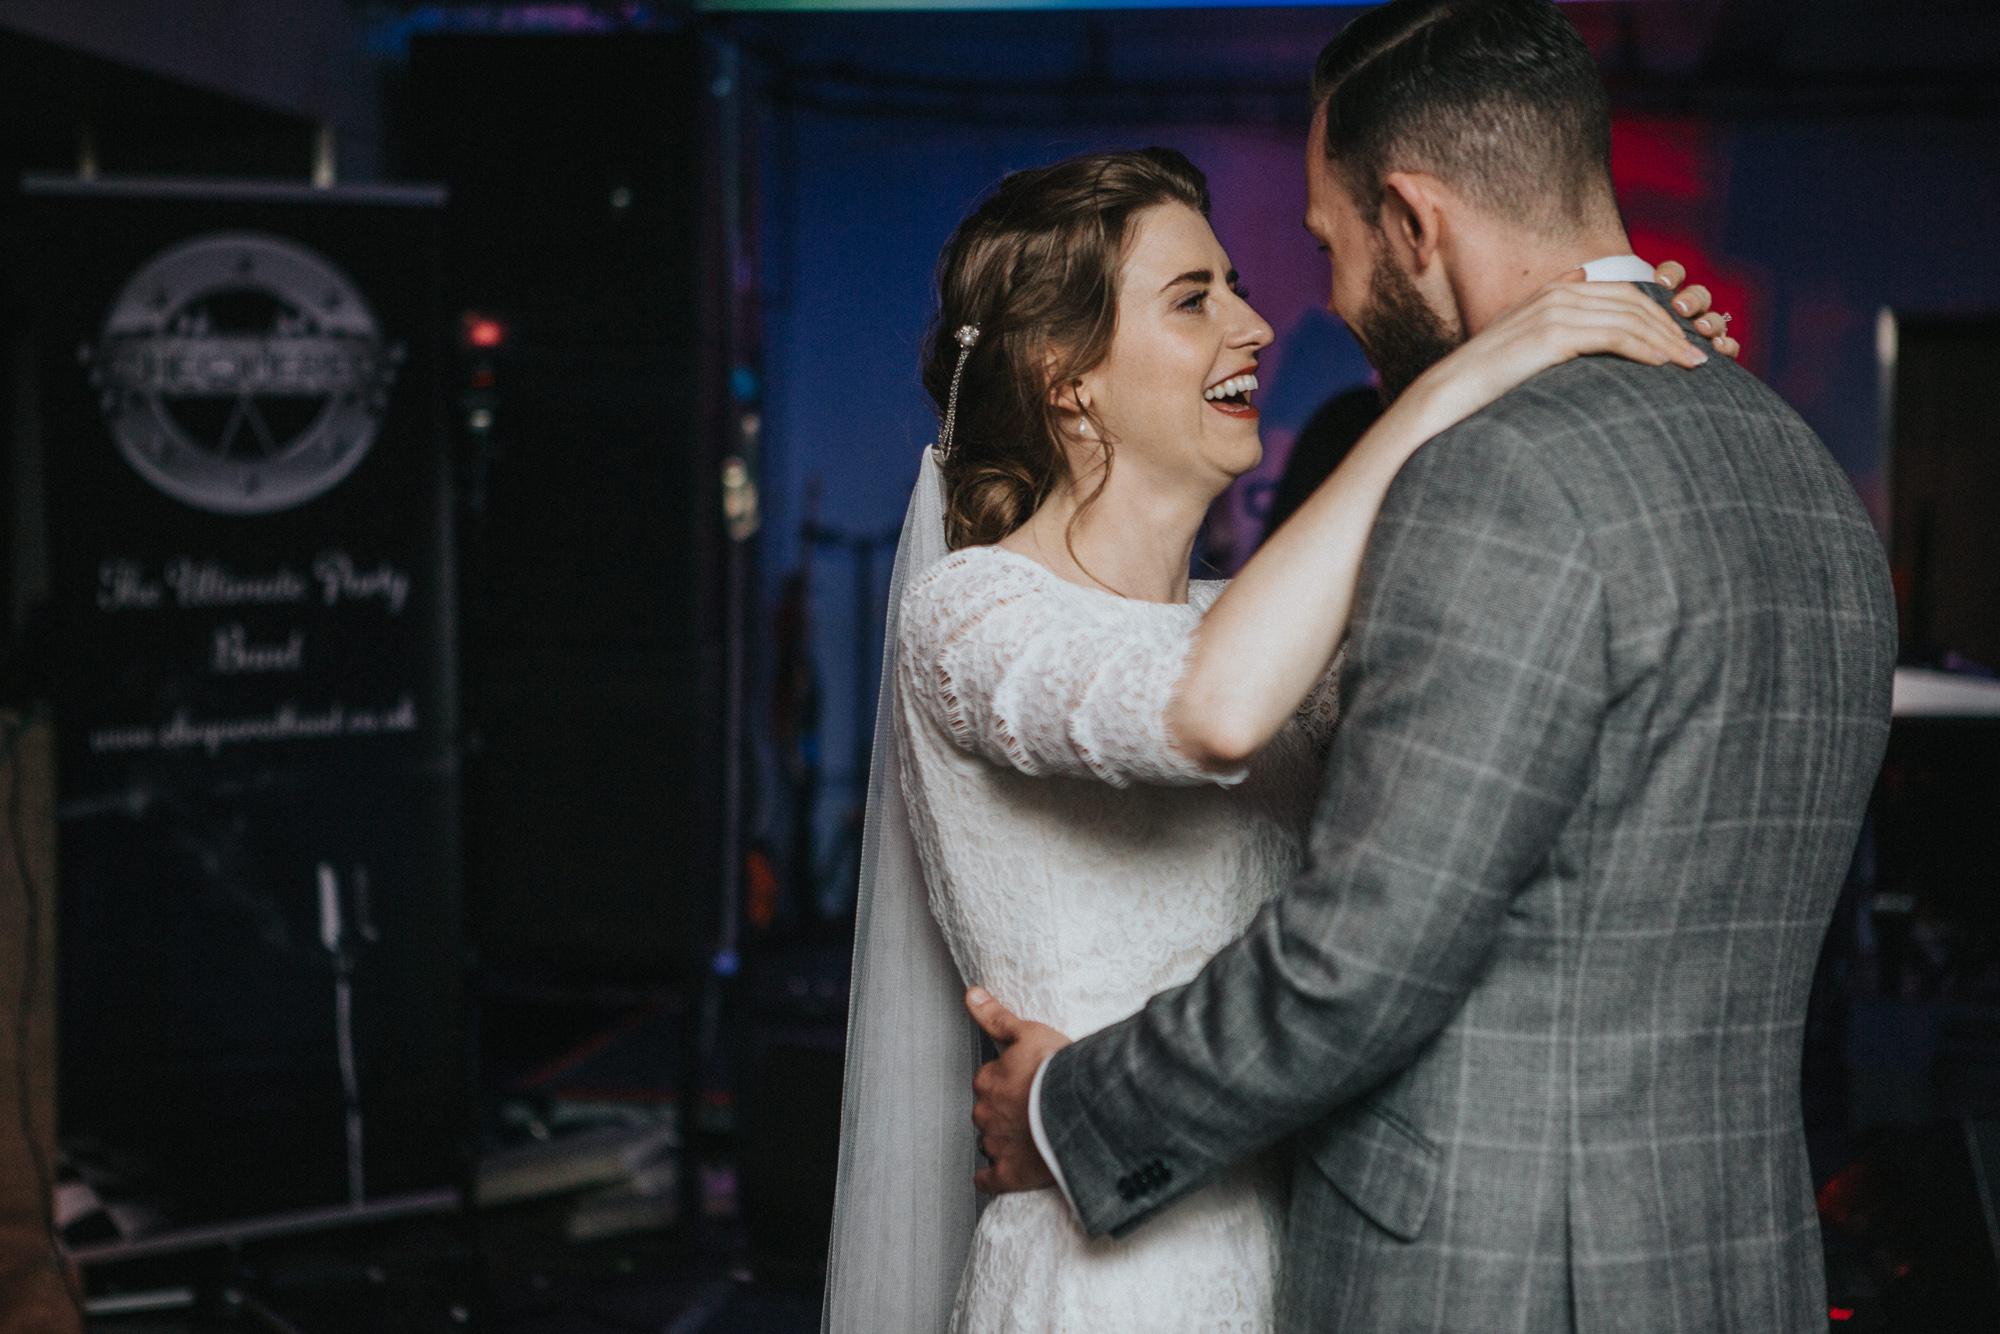 Kate-Beaumont-Lace-Flared-Dahlia-Gown-Leeds-Wedding-Bloom-Weddings-61.jpg